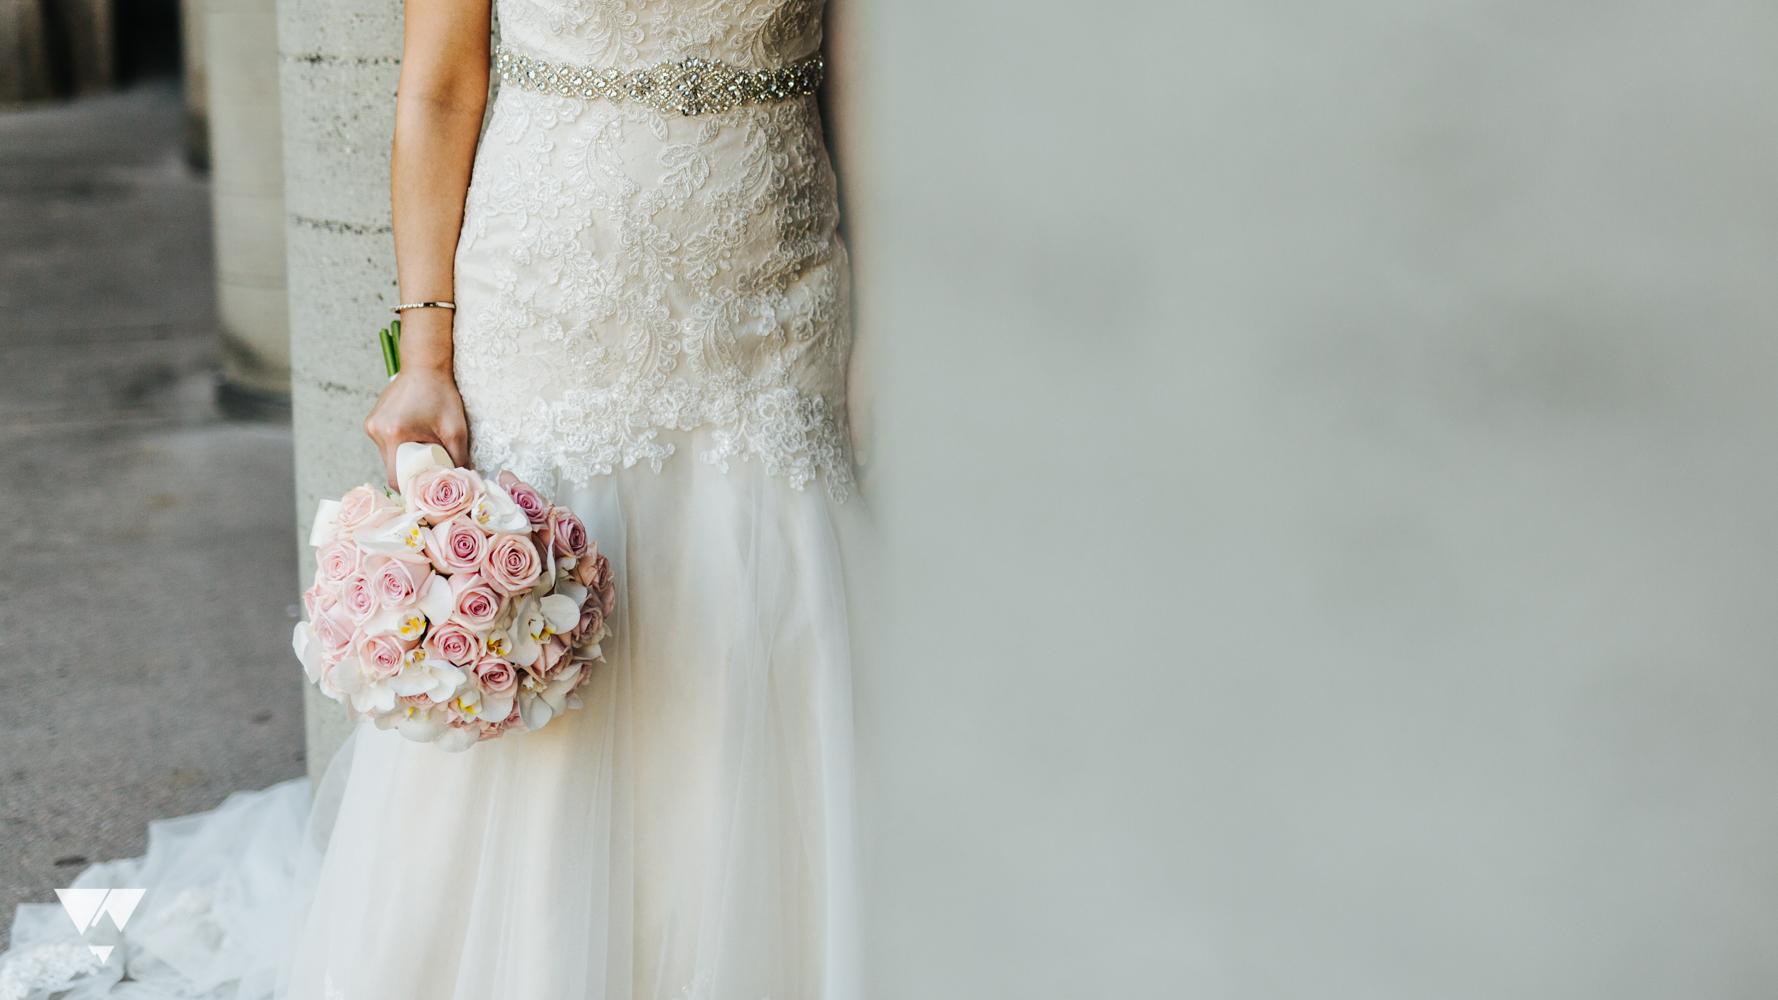 herafilms_wedding_lynn_jeff_hera_selects_web-40.jpg